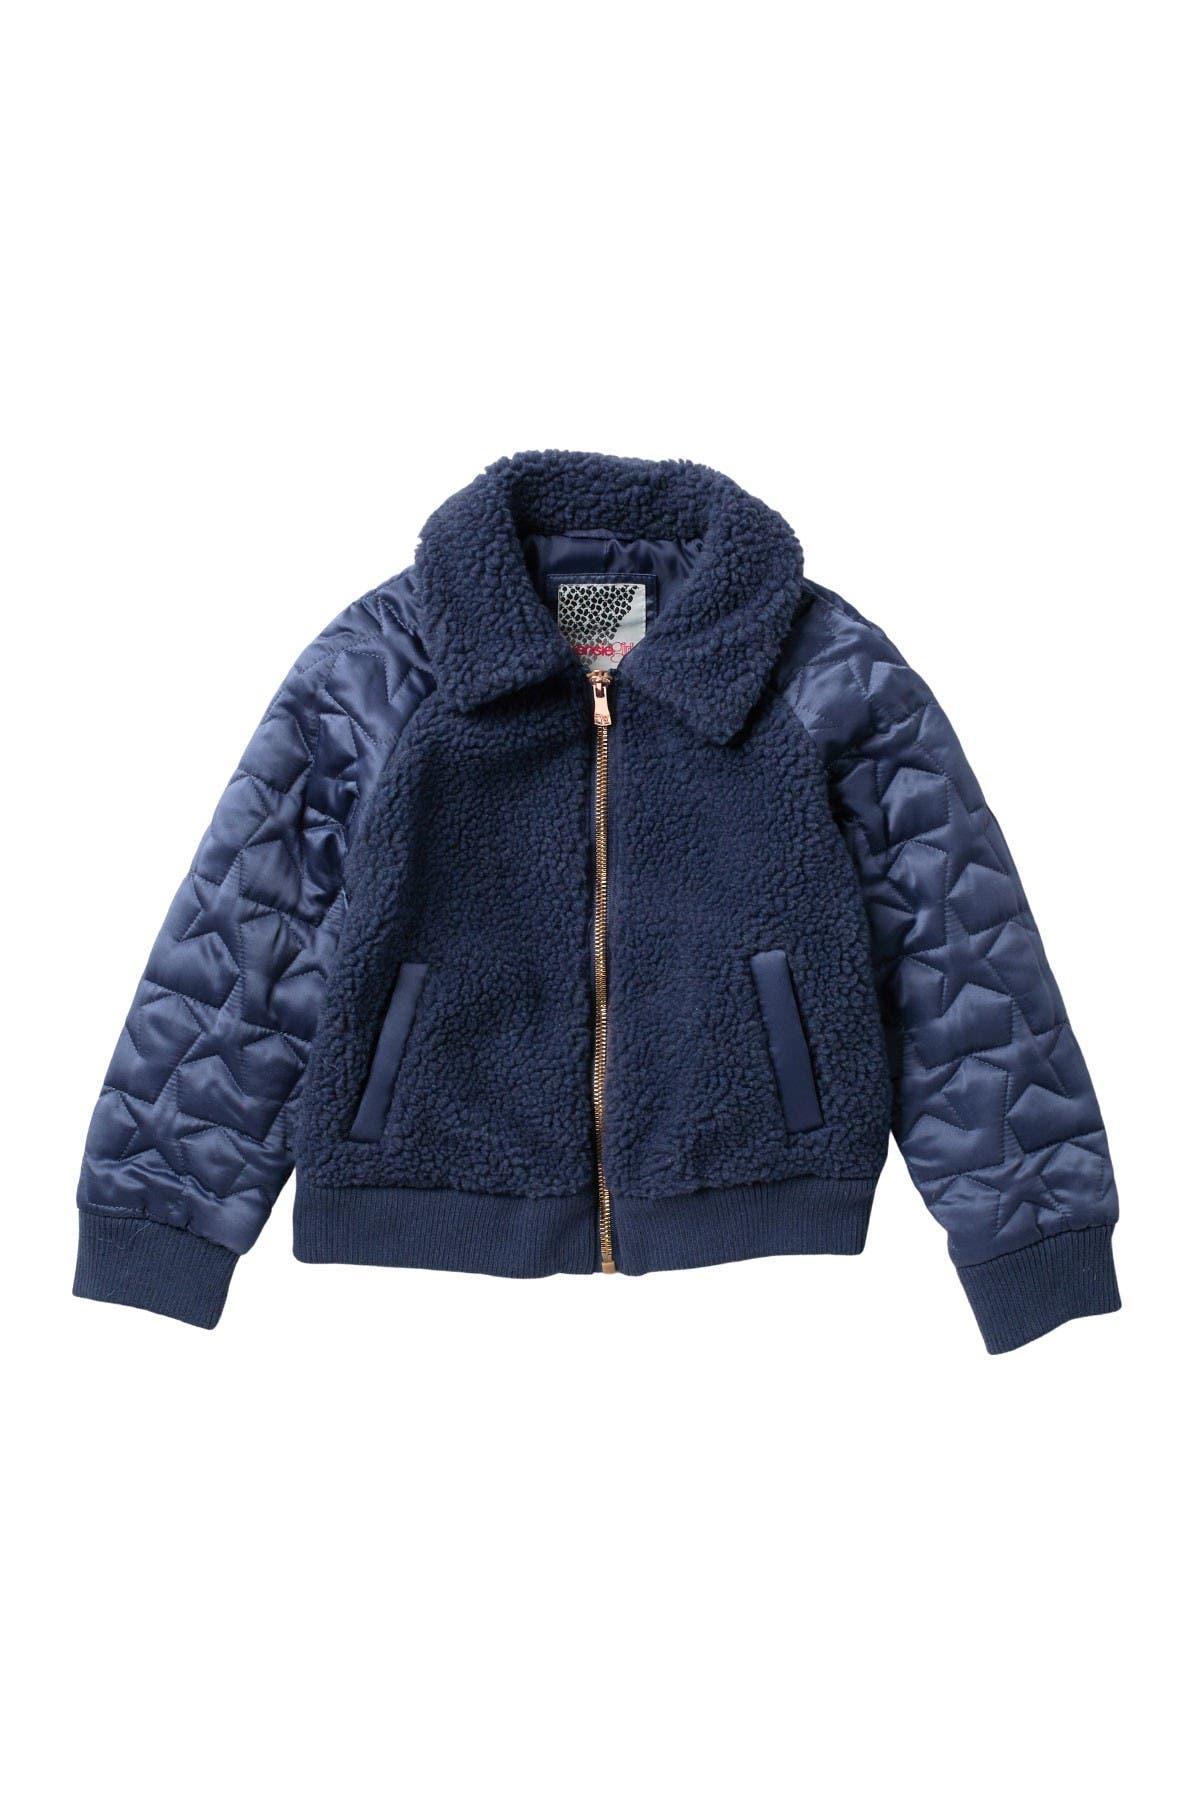 Kensie Girl Teddy Coat Girls Cropped Faux Shearling Fur Jacket